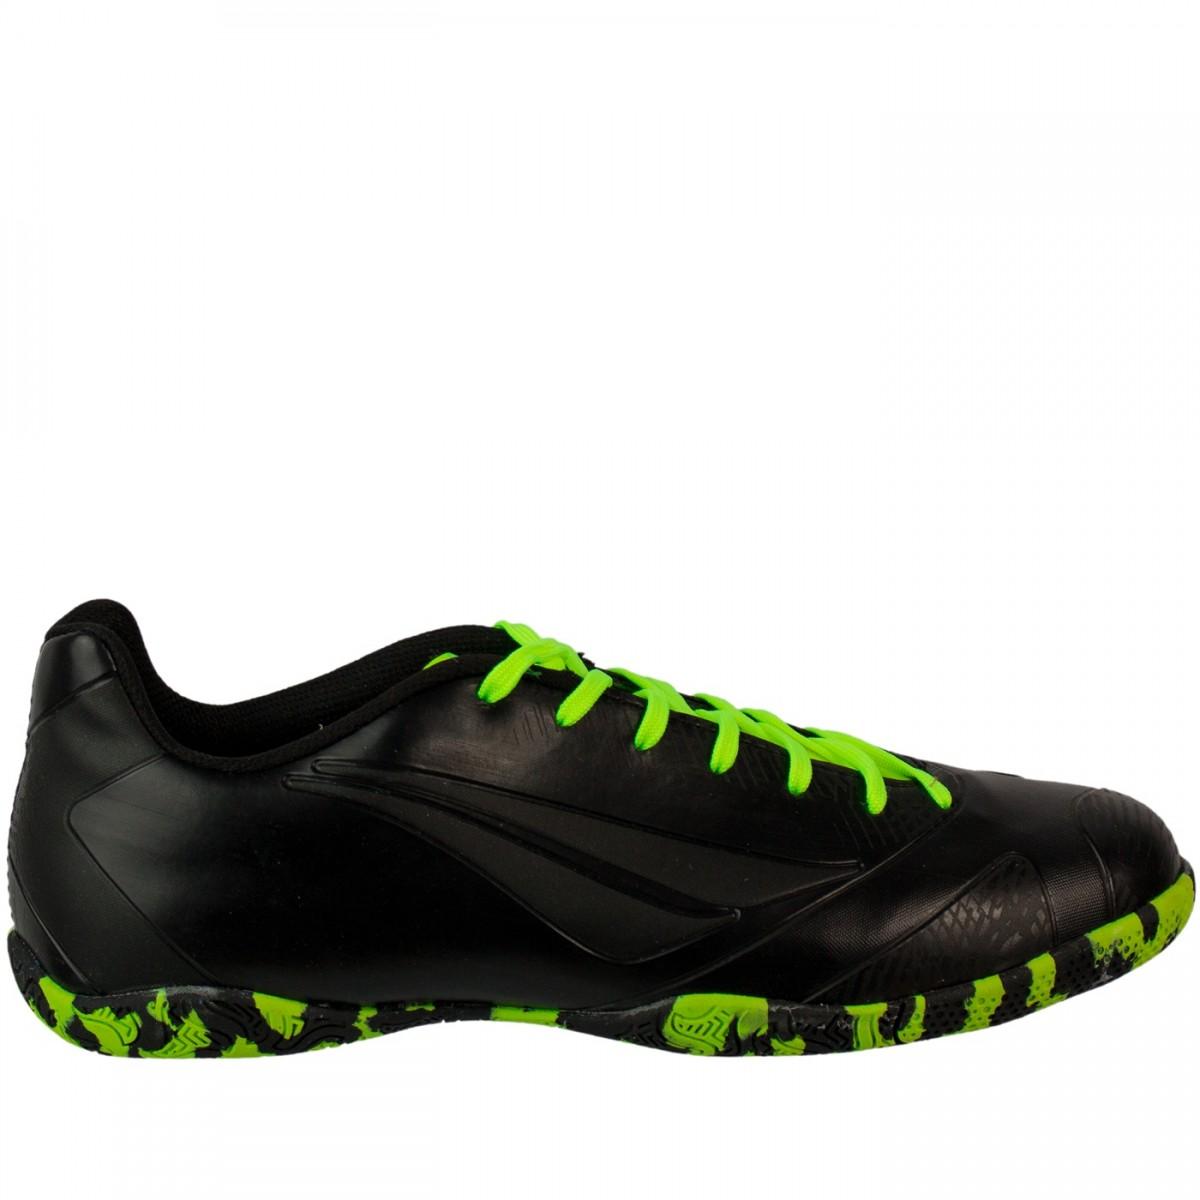 7fb2a5e87055e Bizz Store - Chuteira Futsal Masculina Penalty Victoria RX Preta